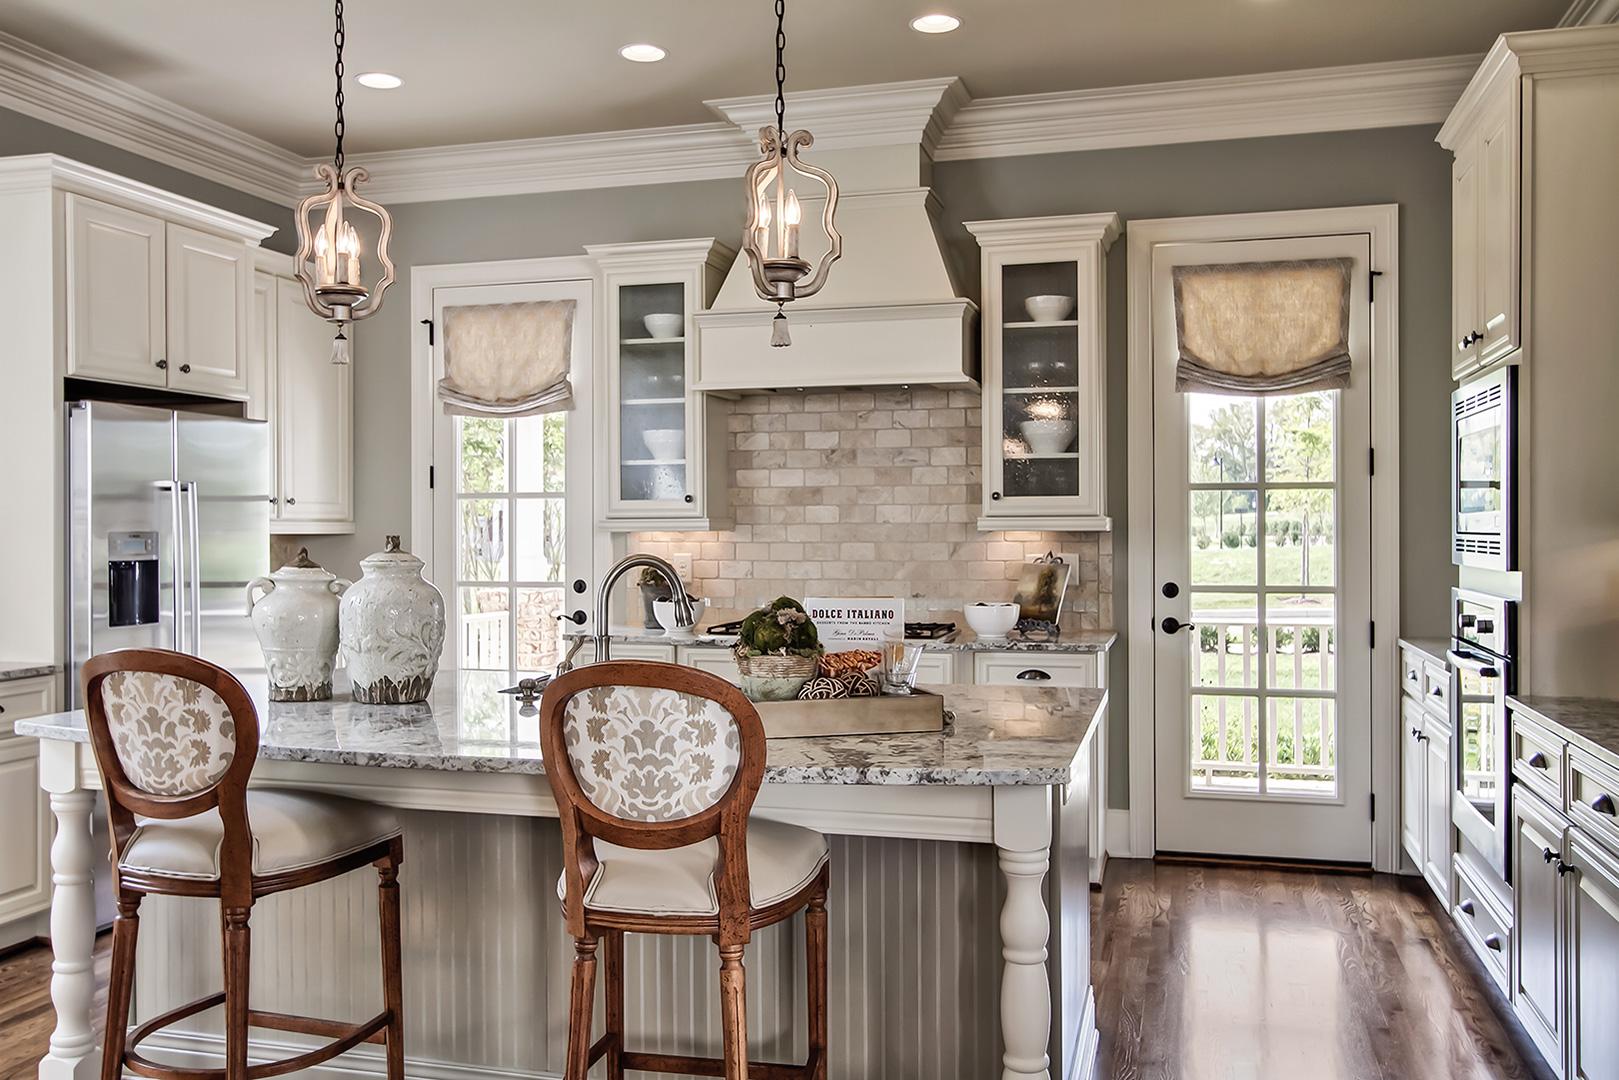 Cl Kitchens Orlando - insurserviceonline.com